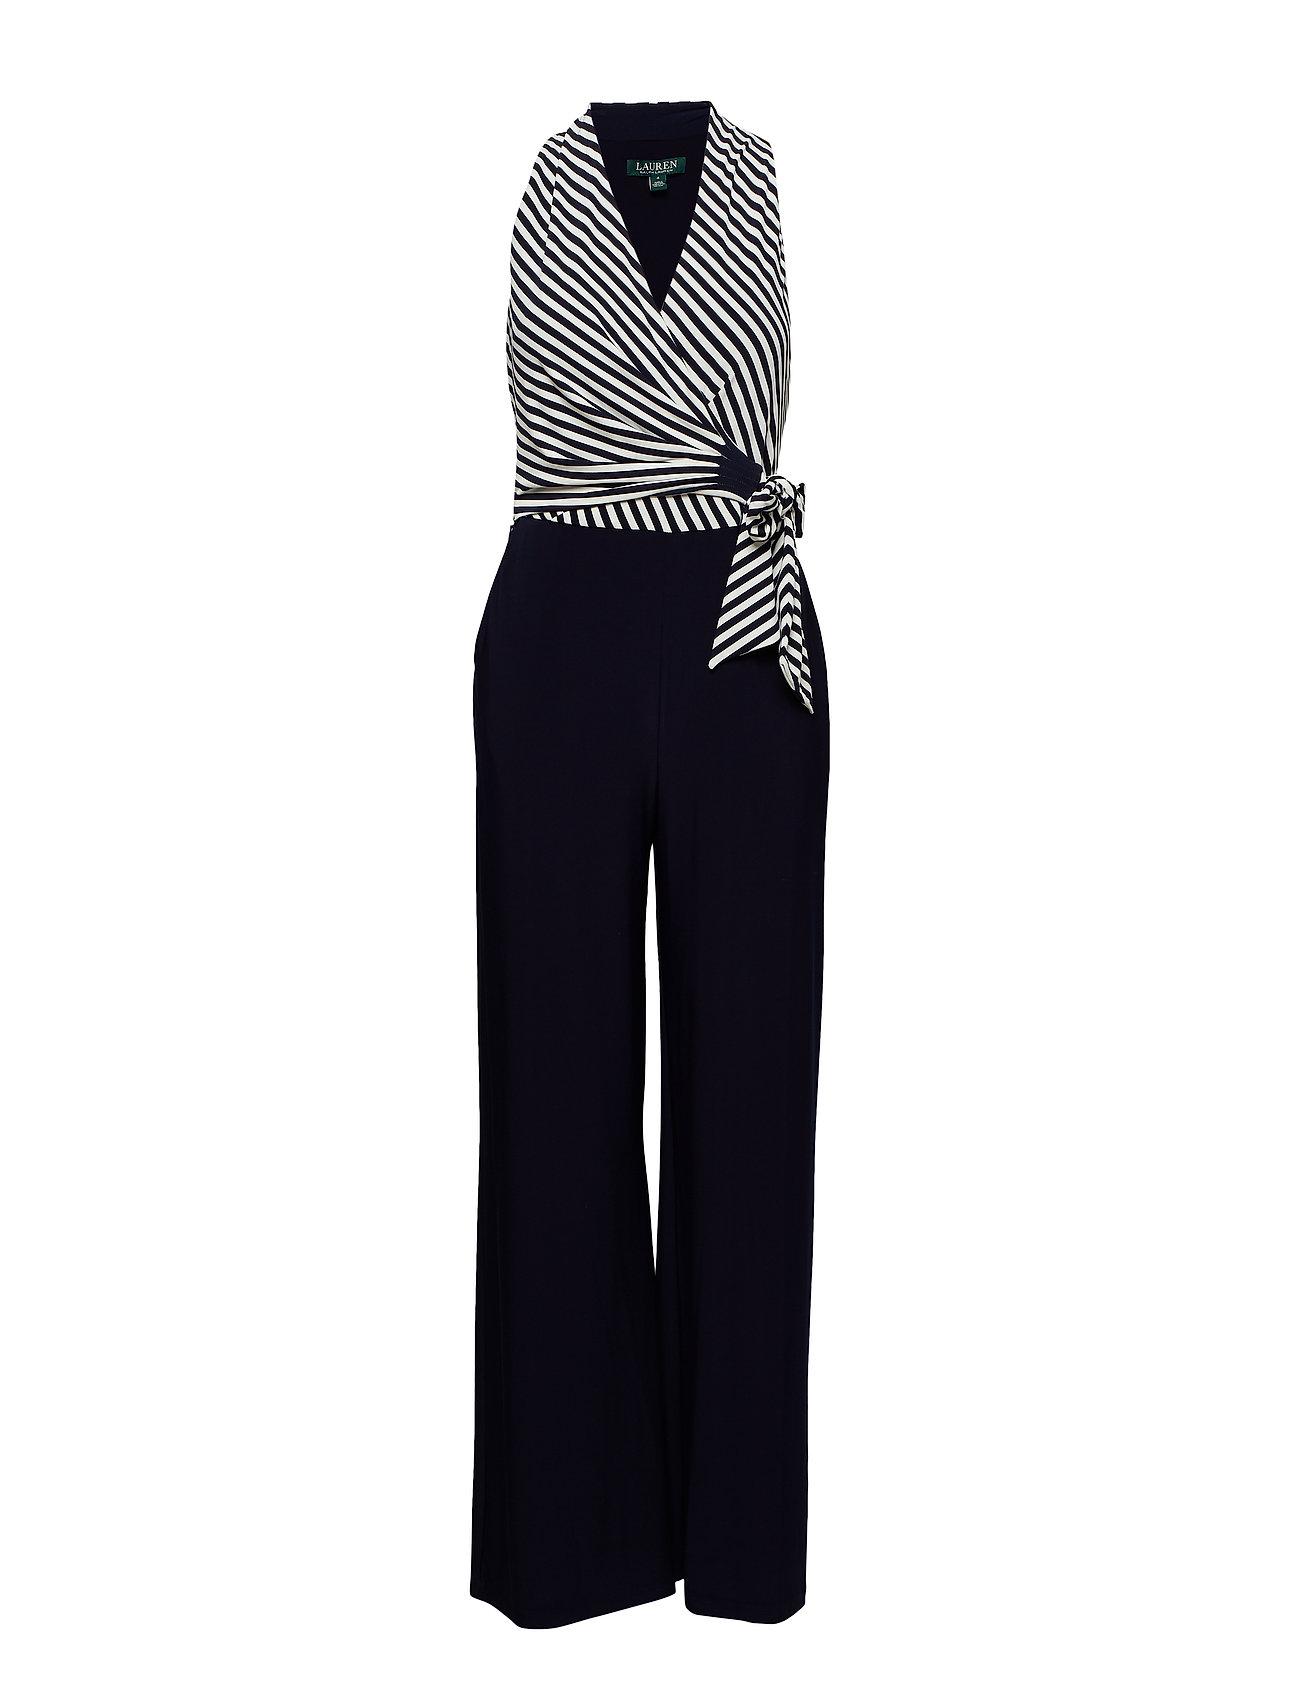 4533c44f6945 Striped Jersey Jumpsuit (Lighthouse Navy c) (£180) - Lauren Ralph ...